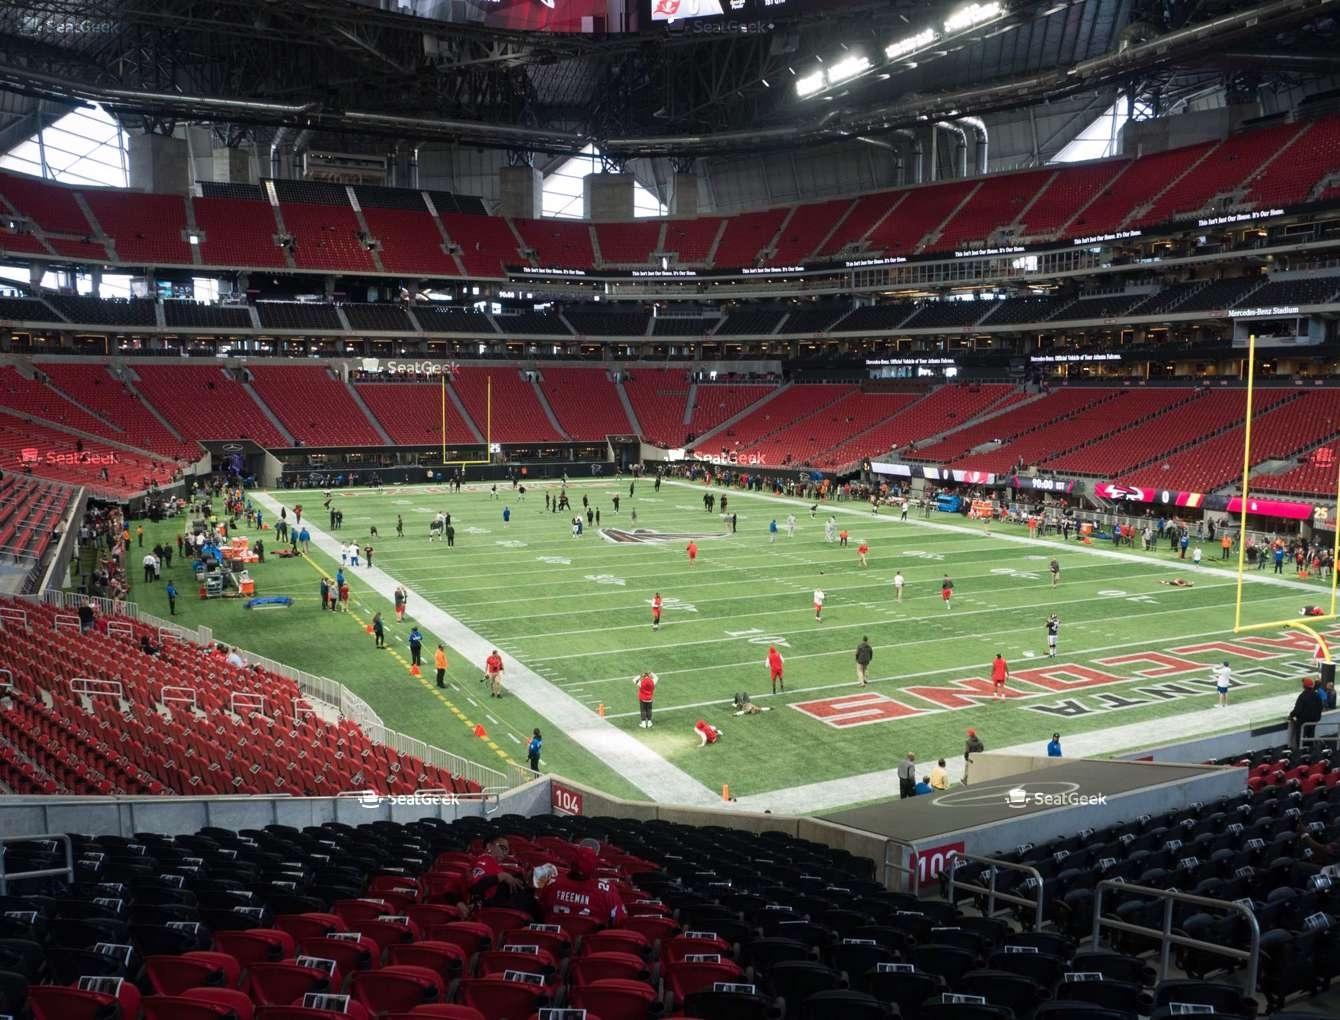 Mercedes-Benz Stadium Section 104 Seat Views | Seatgeek for Mercedes Benz Stadium Super Bowl Map